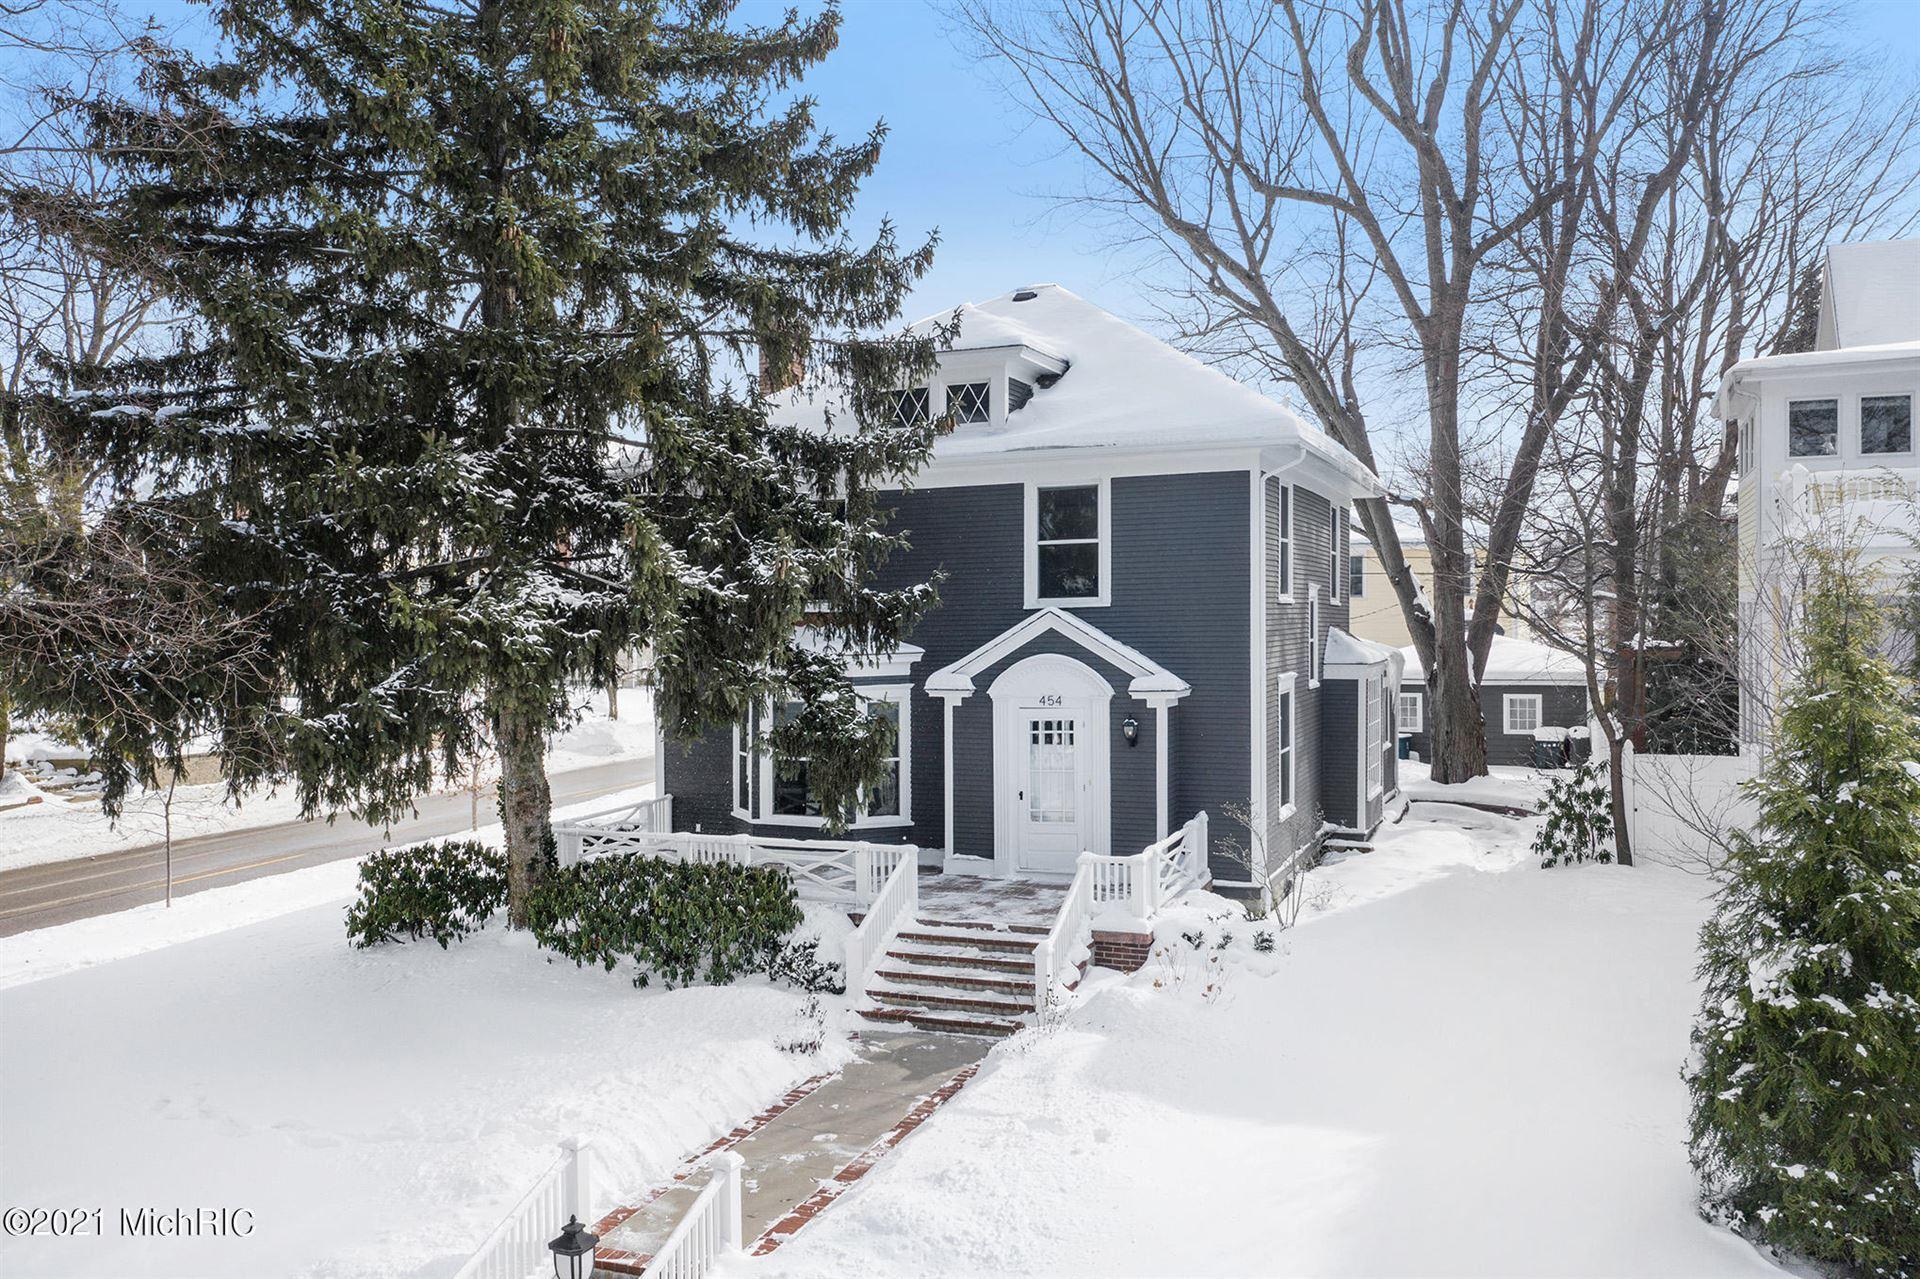 454 Sheldon Terrace, Grand Haven, MI 49417 - MLS#: 21004979